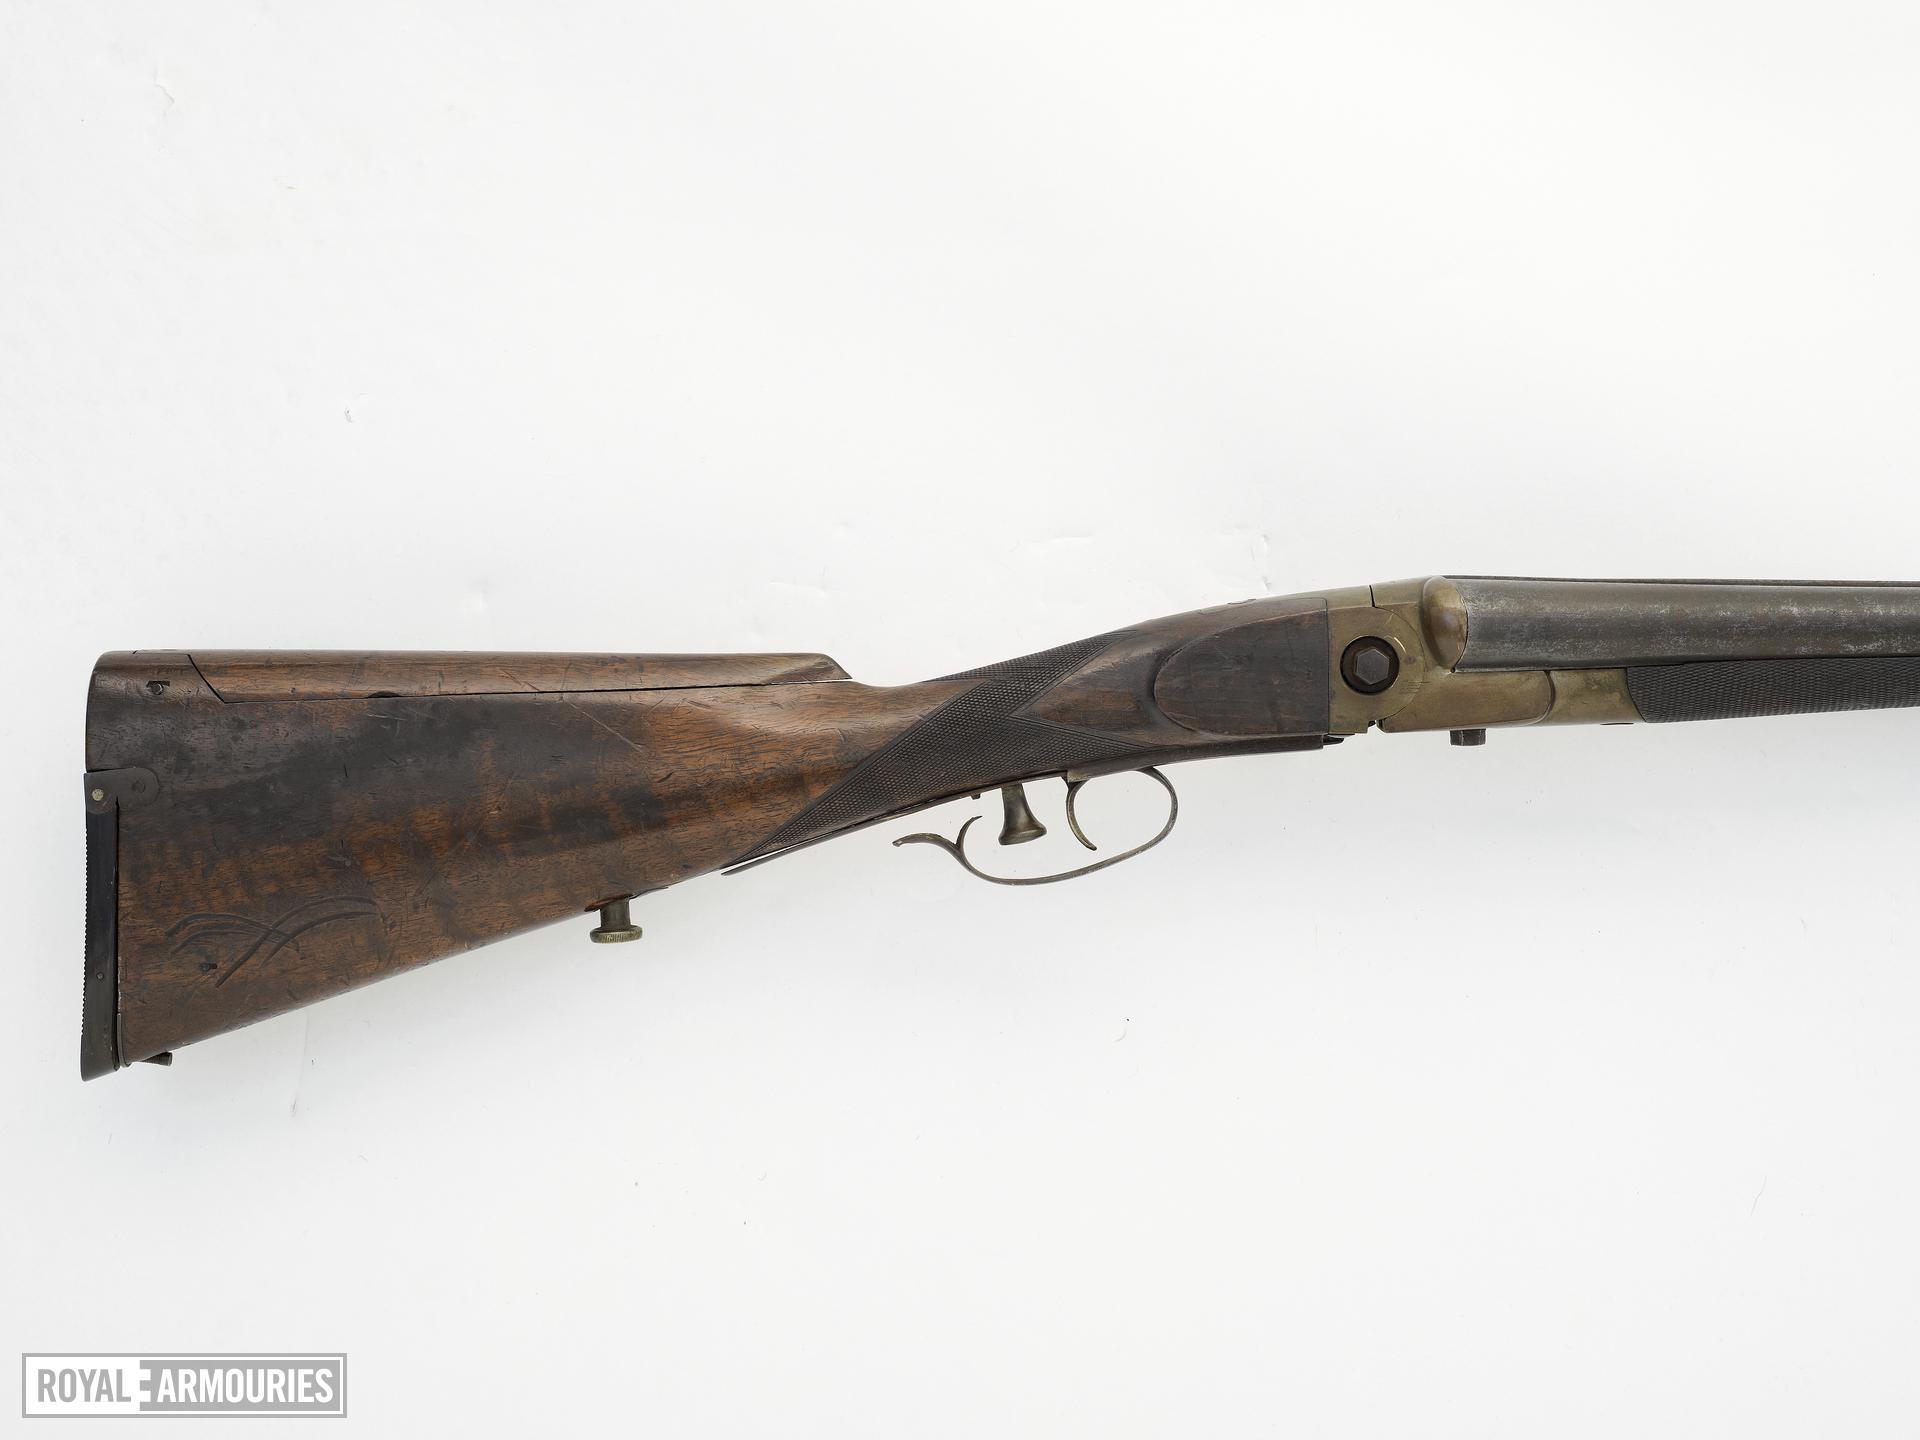 Centrefire breech-loading double-barrelled shotgun